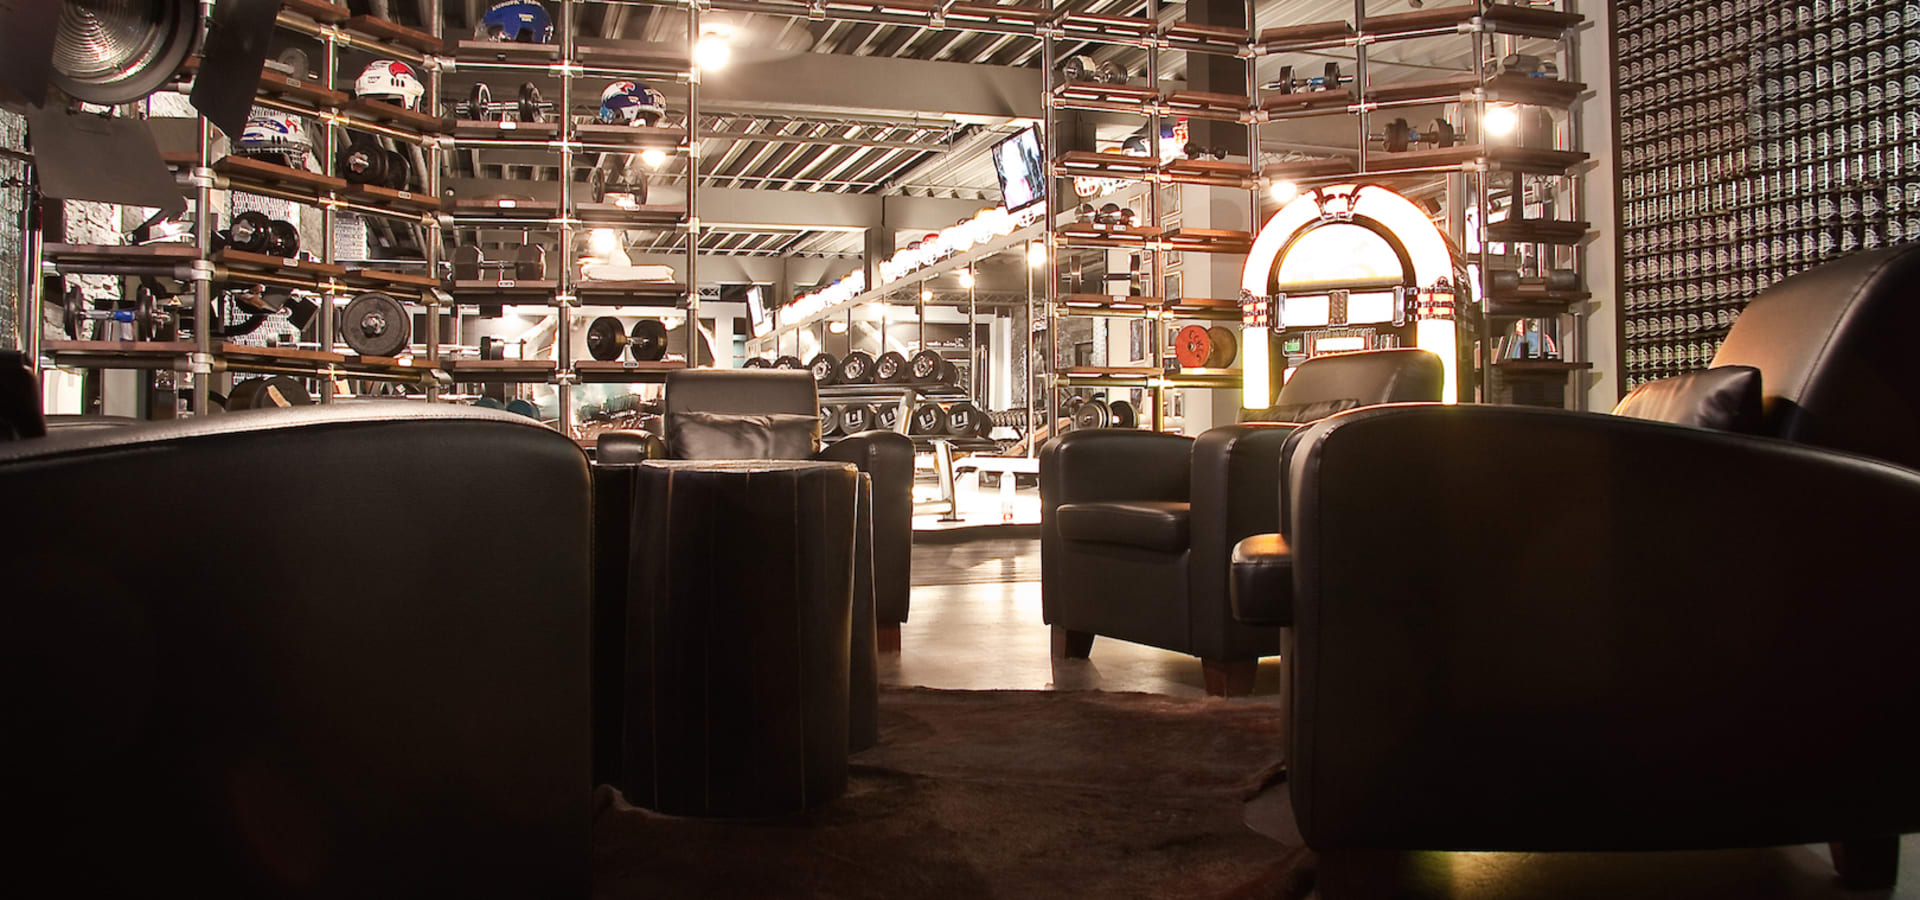 puls fitness club stuttgart deutschland de fifty fifty. Black Bedroom Furniture Sets. Home Design Ideas